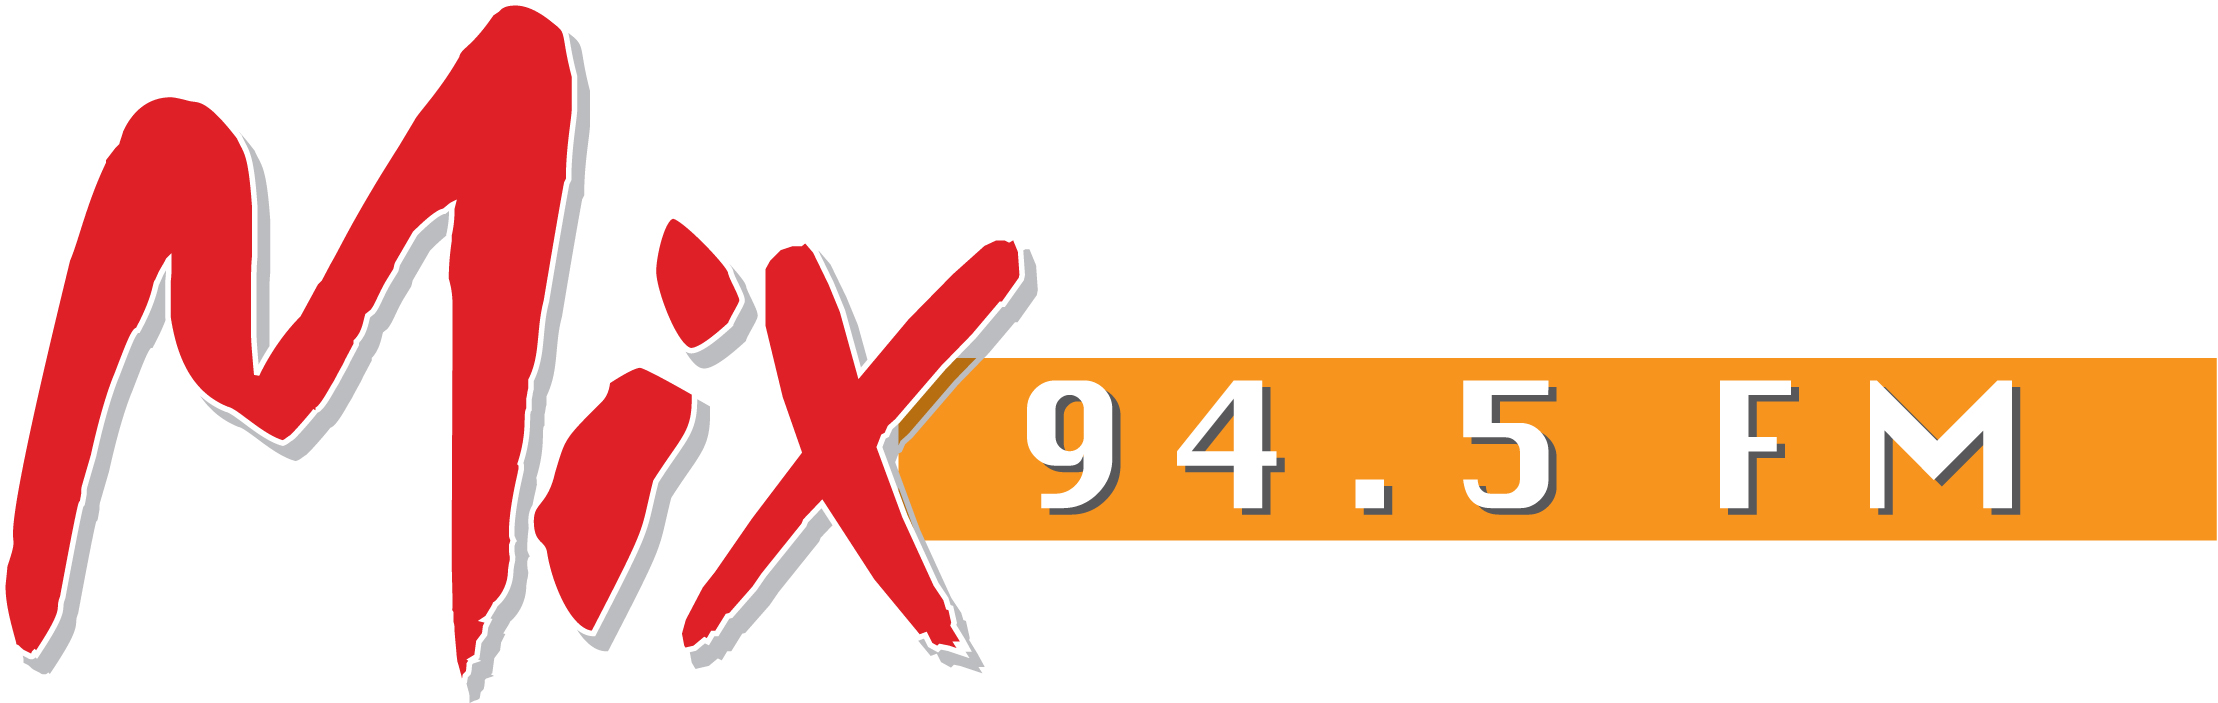 Mix 94.5FM logo.jpg